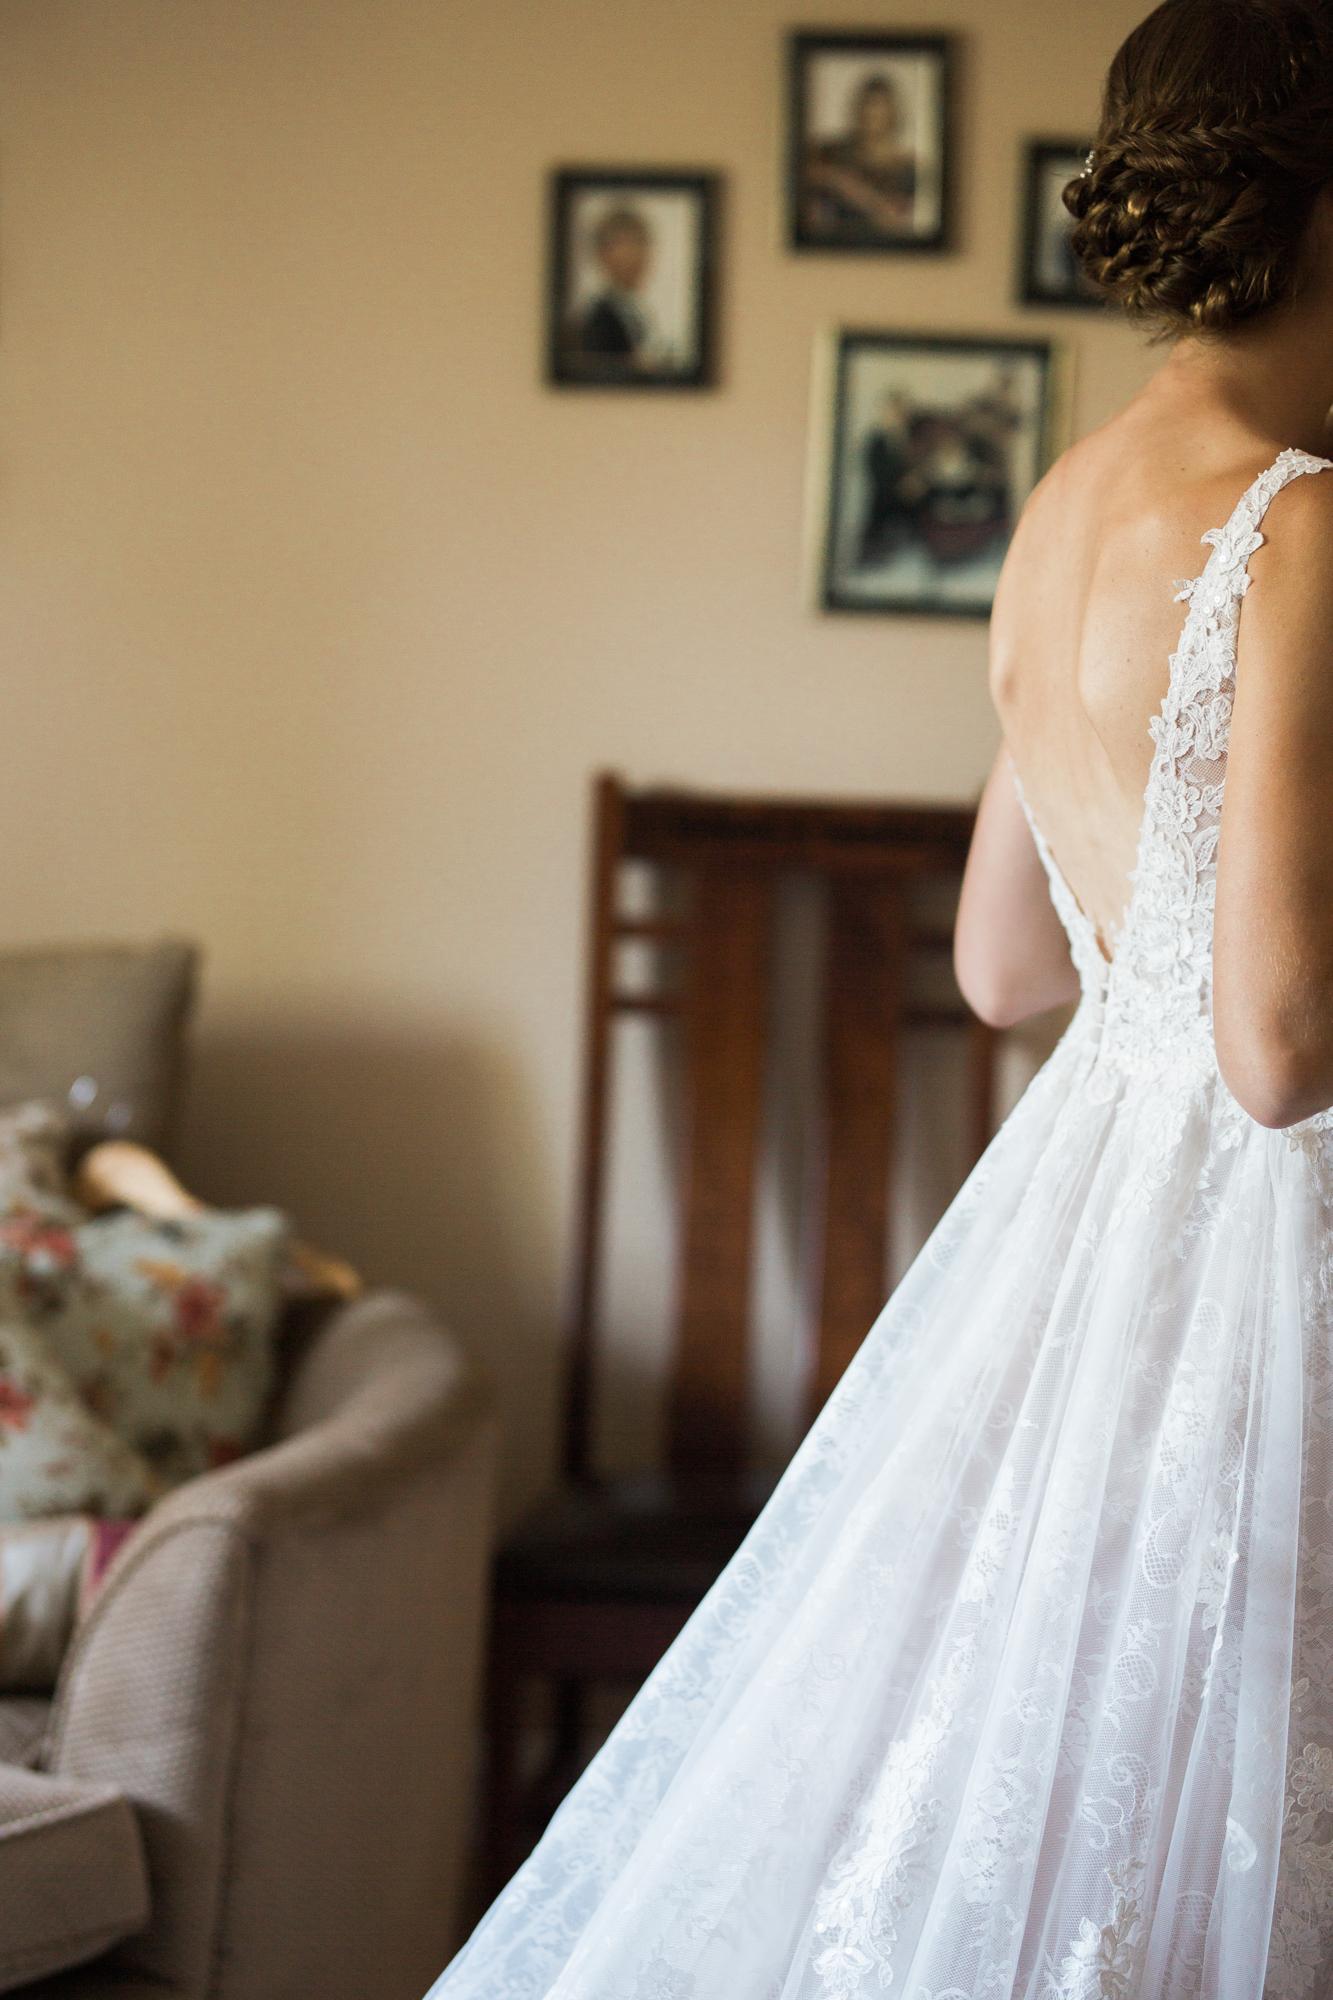 Calgary-wedding-photographer-NN-9.jpg